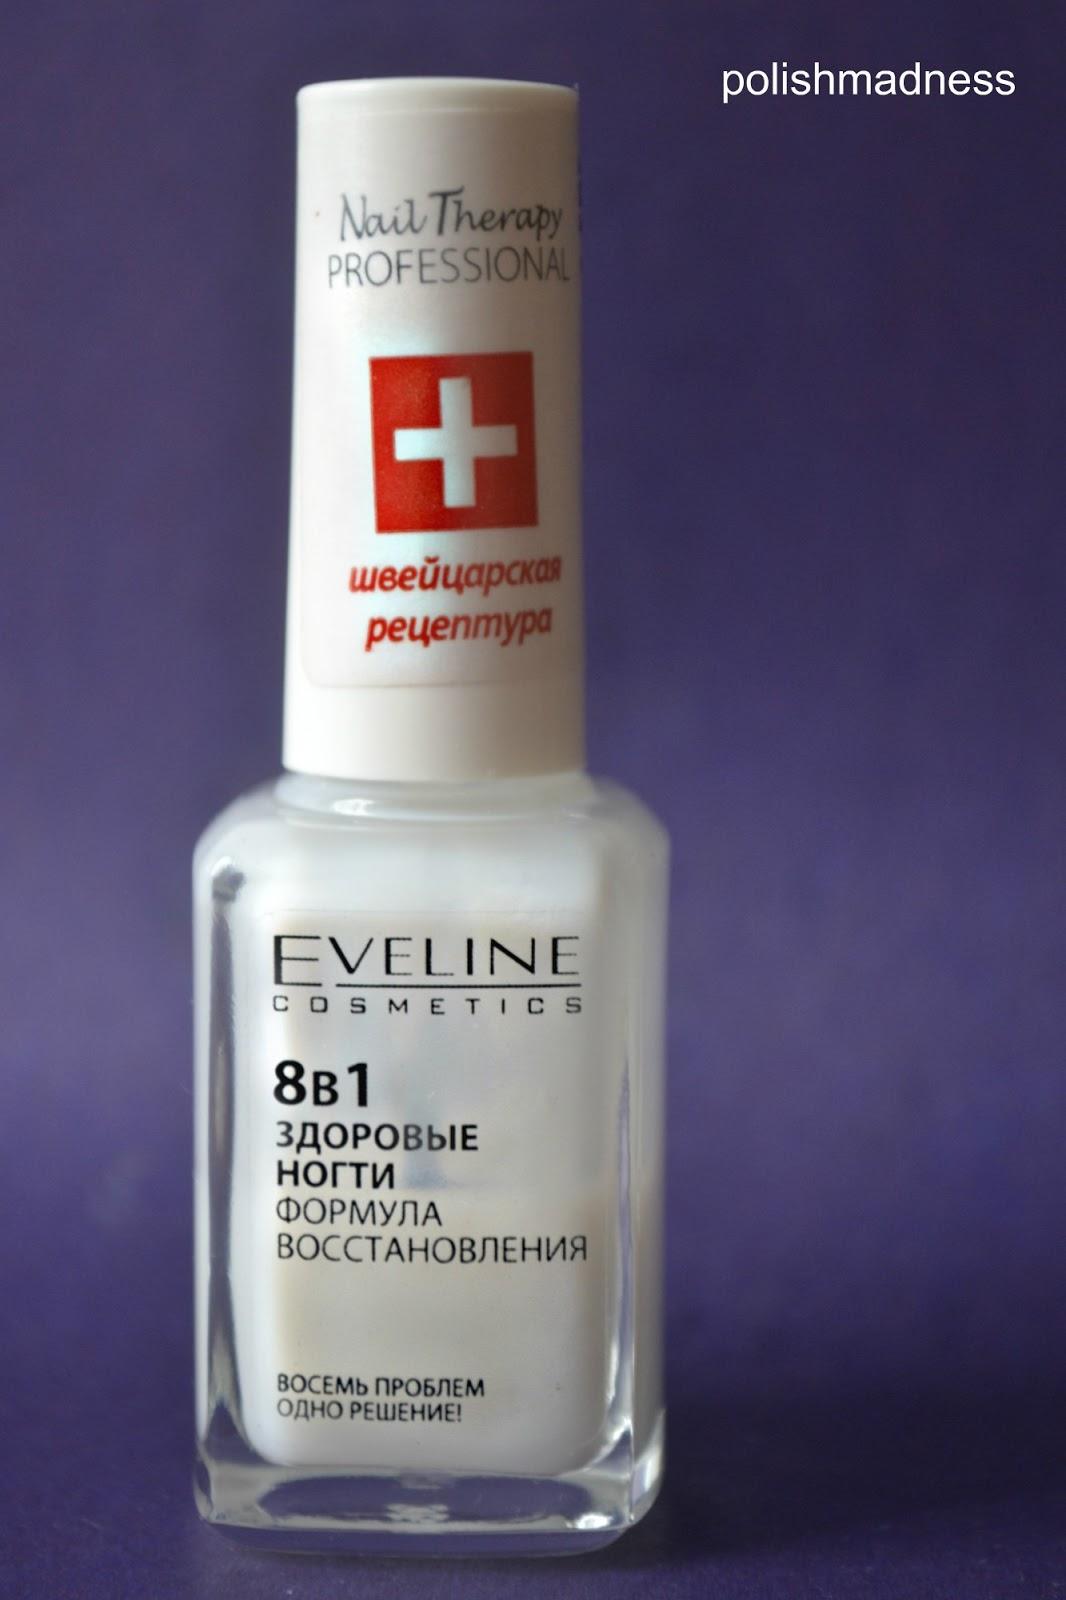 Polish madness: препарат для регенерации ногтей eveline cosmetics \